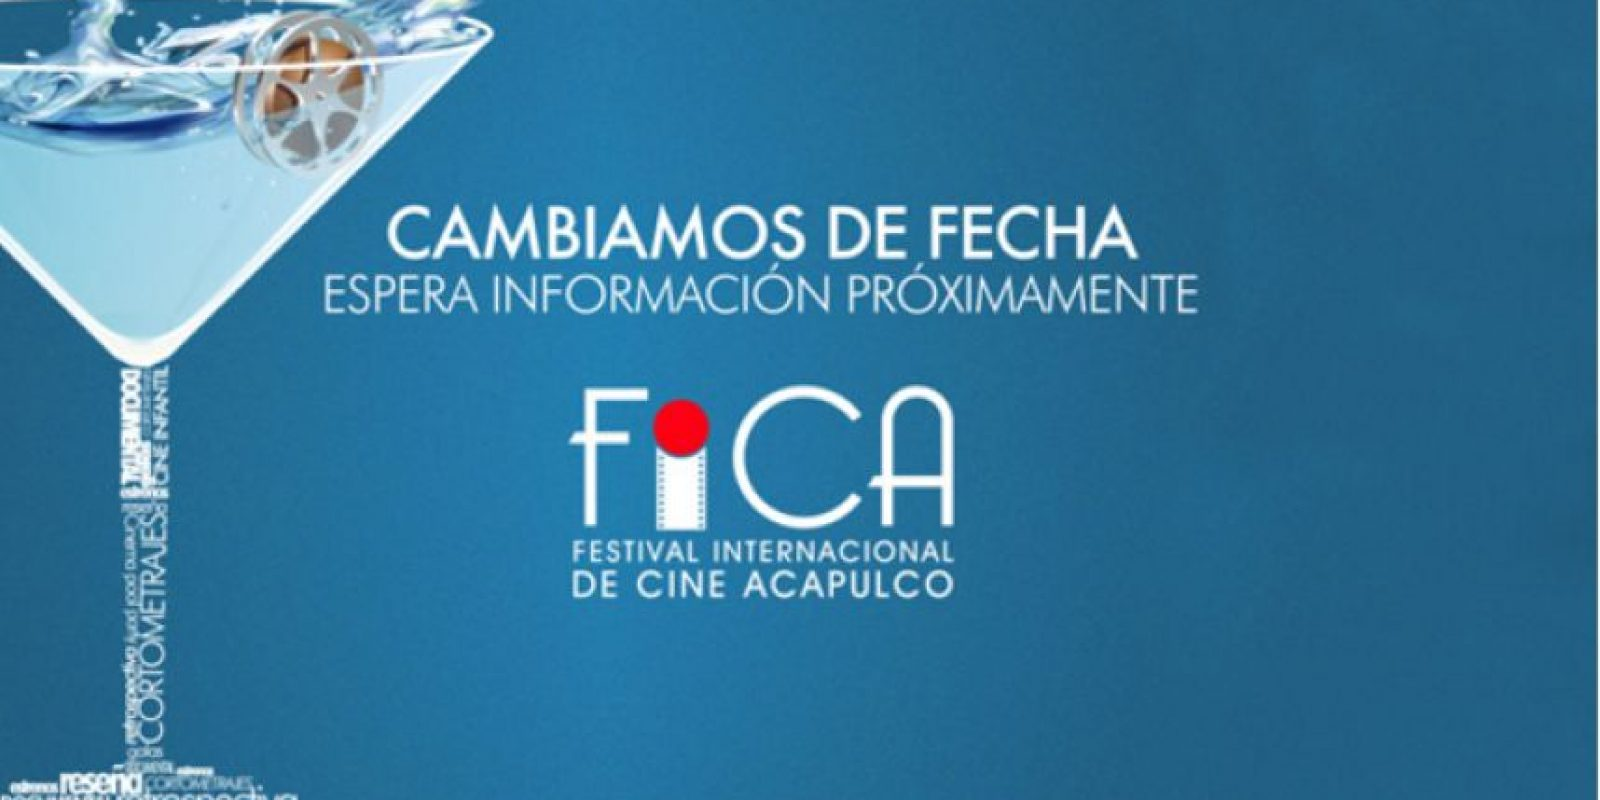 Foto:Facebook/FICA